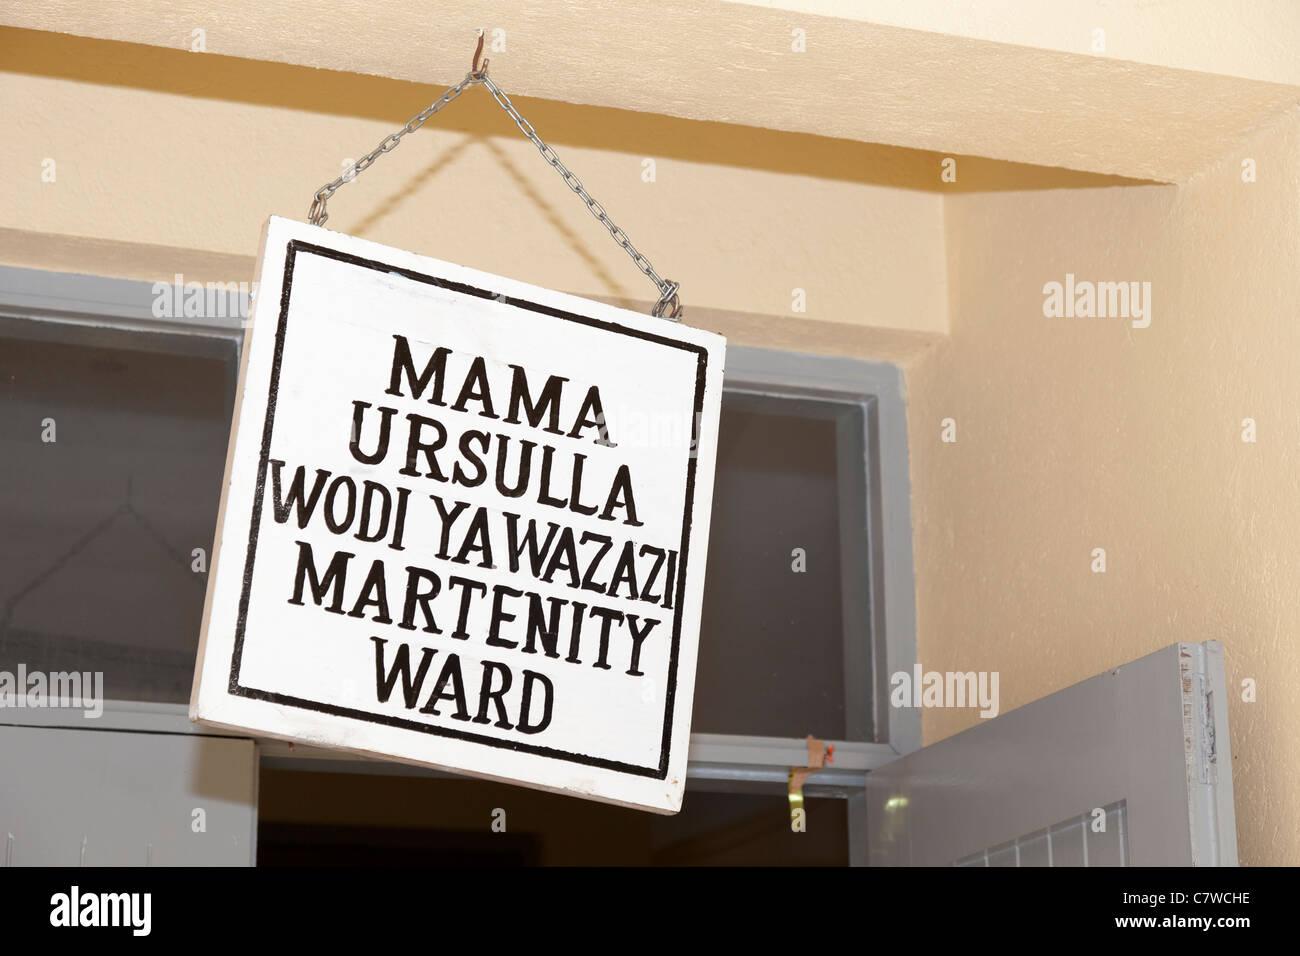 Signer pour la 'Mama Yawazazi Ursulla Wodi' Maternité Hôpital Marangu, Moshi, Tanzanie Photo Stock